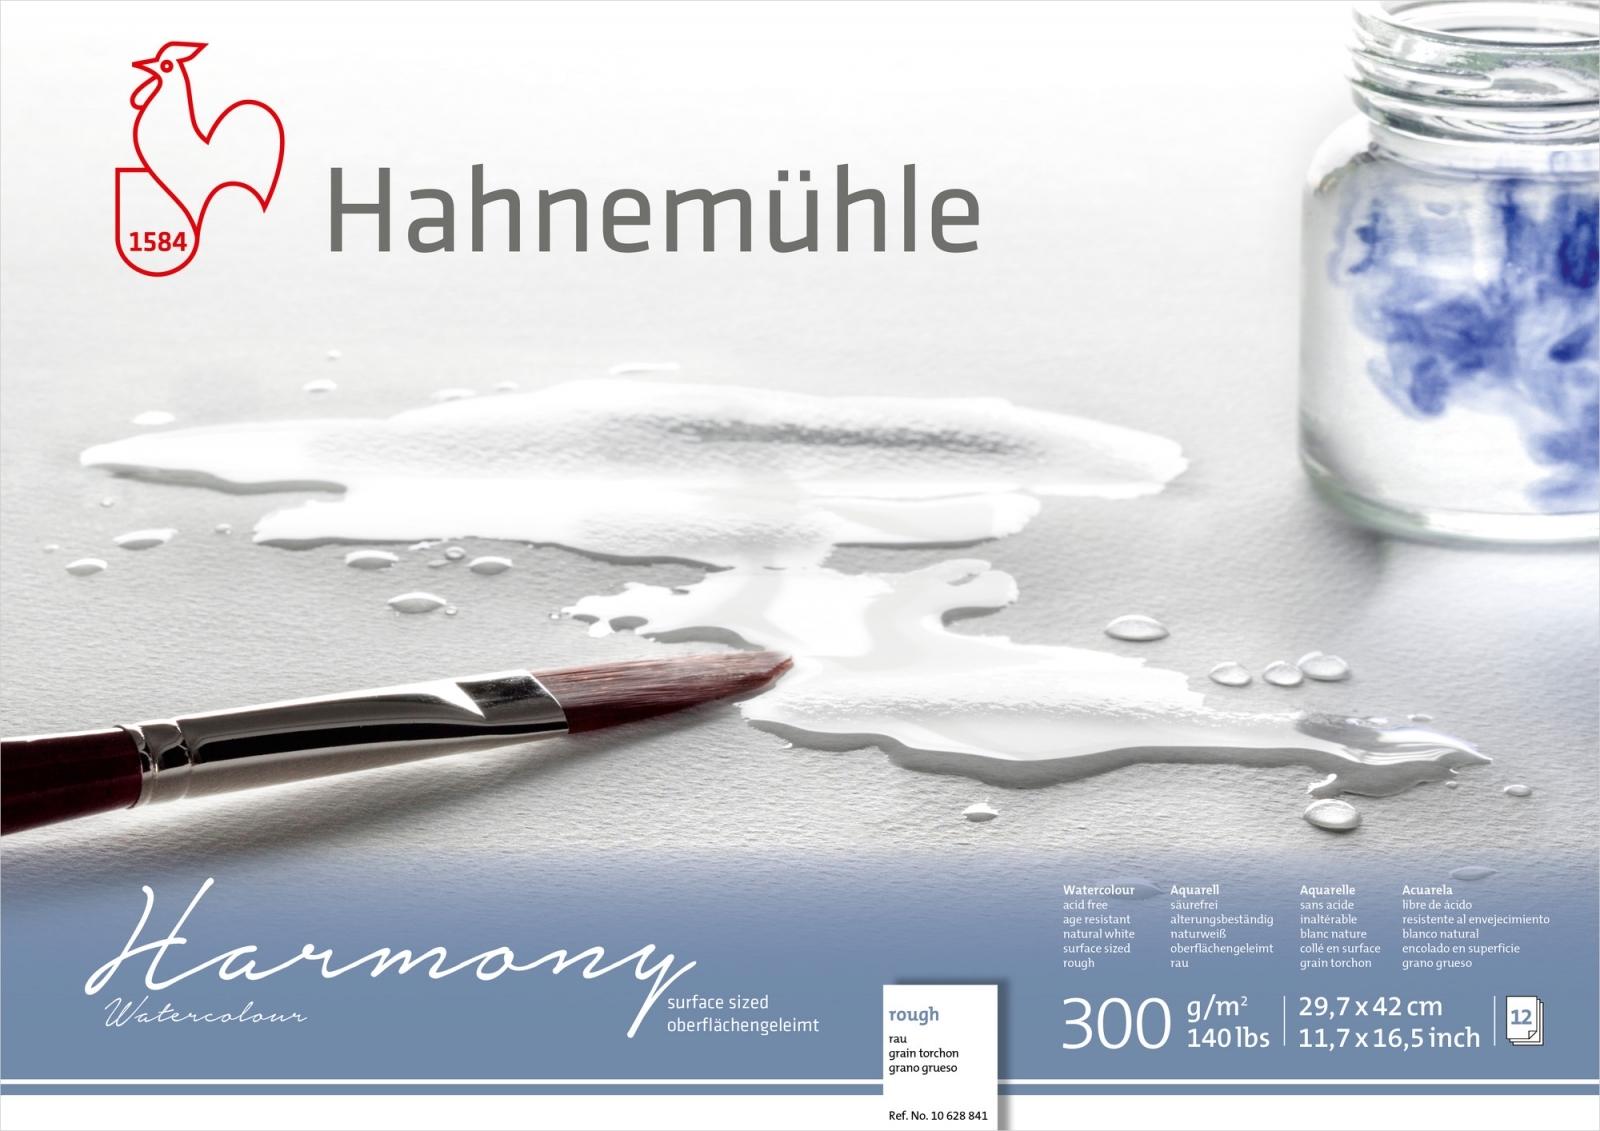 PAPEL HAHNEMUHLE HARMONY WATERCOLOUR, 300 G/M², ROUGH 12fls 29,7X42cm - A3 (10628841)  - Papelaria Botafogo